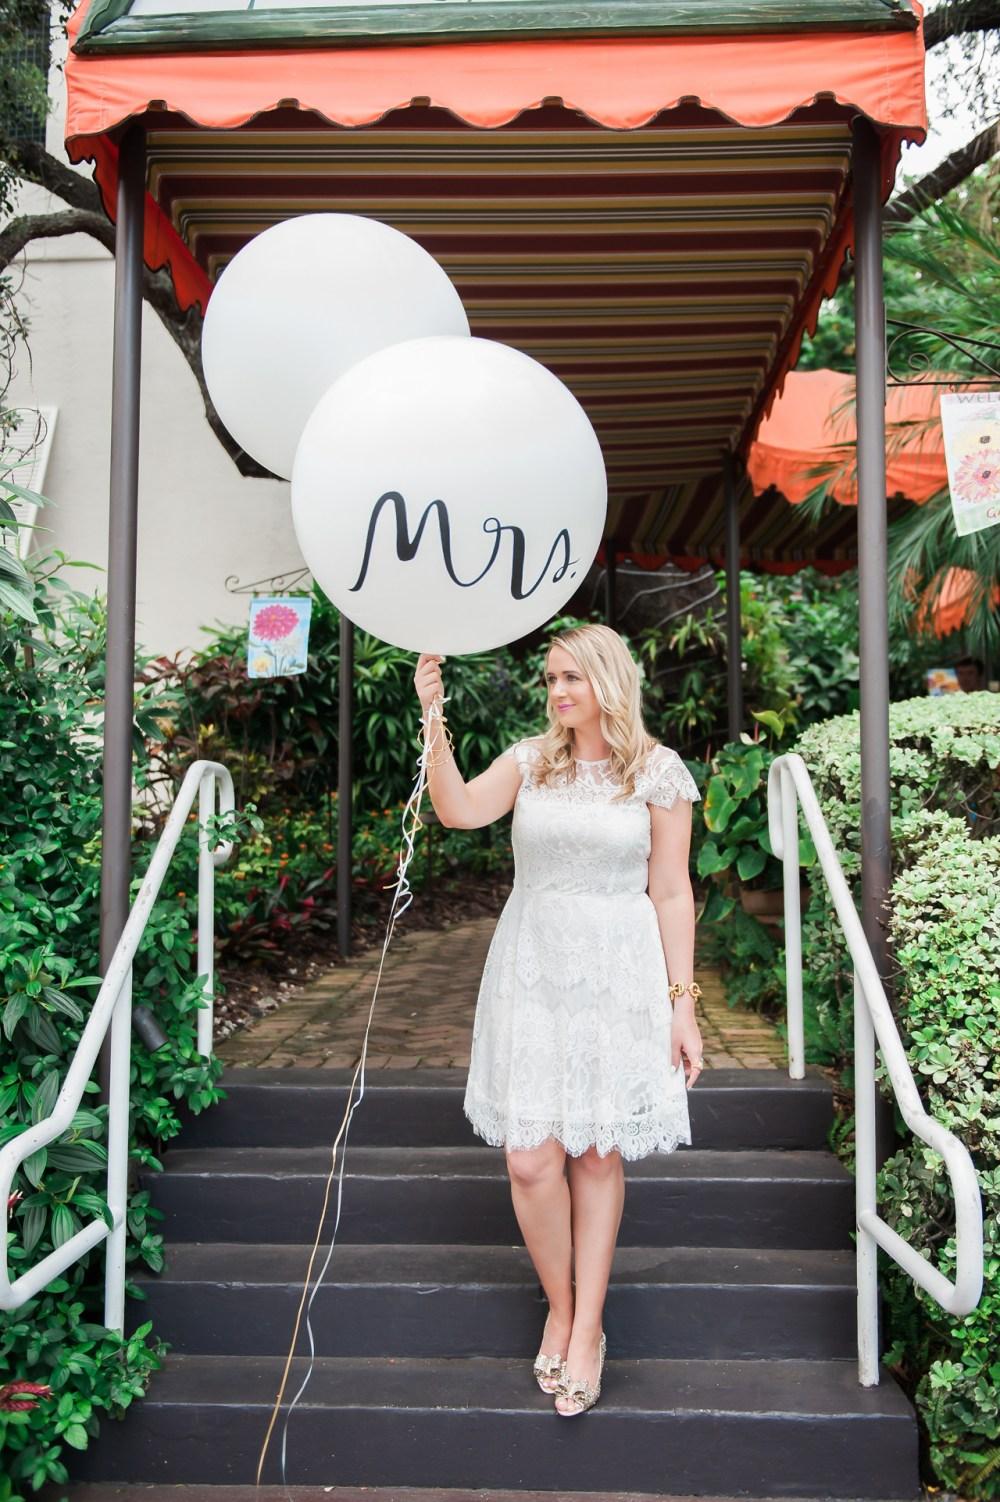 Kate Spade Bridal Shower Mrs. Balloon Fancy Things White Dress